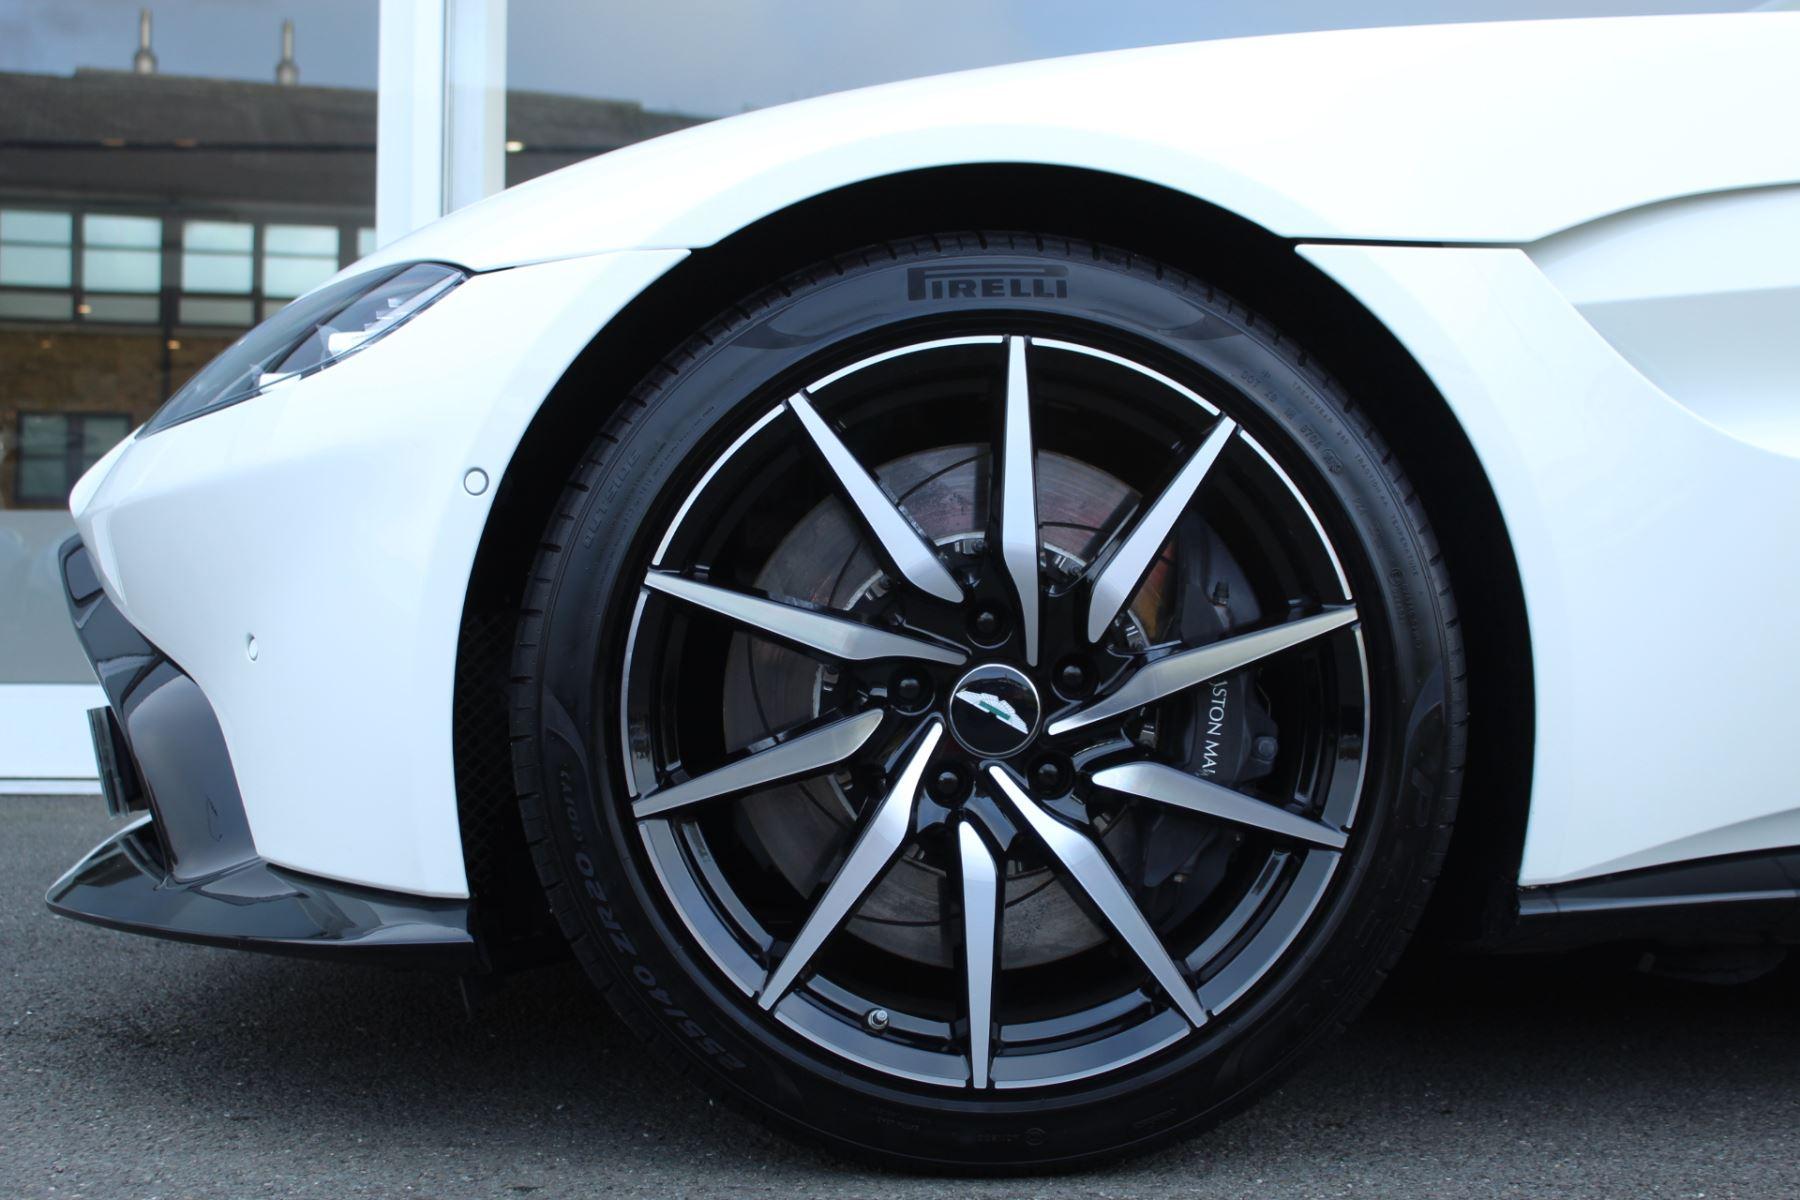 Aston Martin New Vantage 2dr ZF 8 Speed image 13